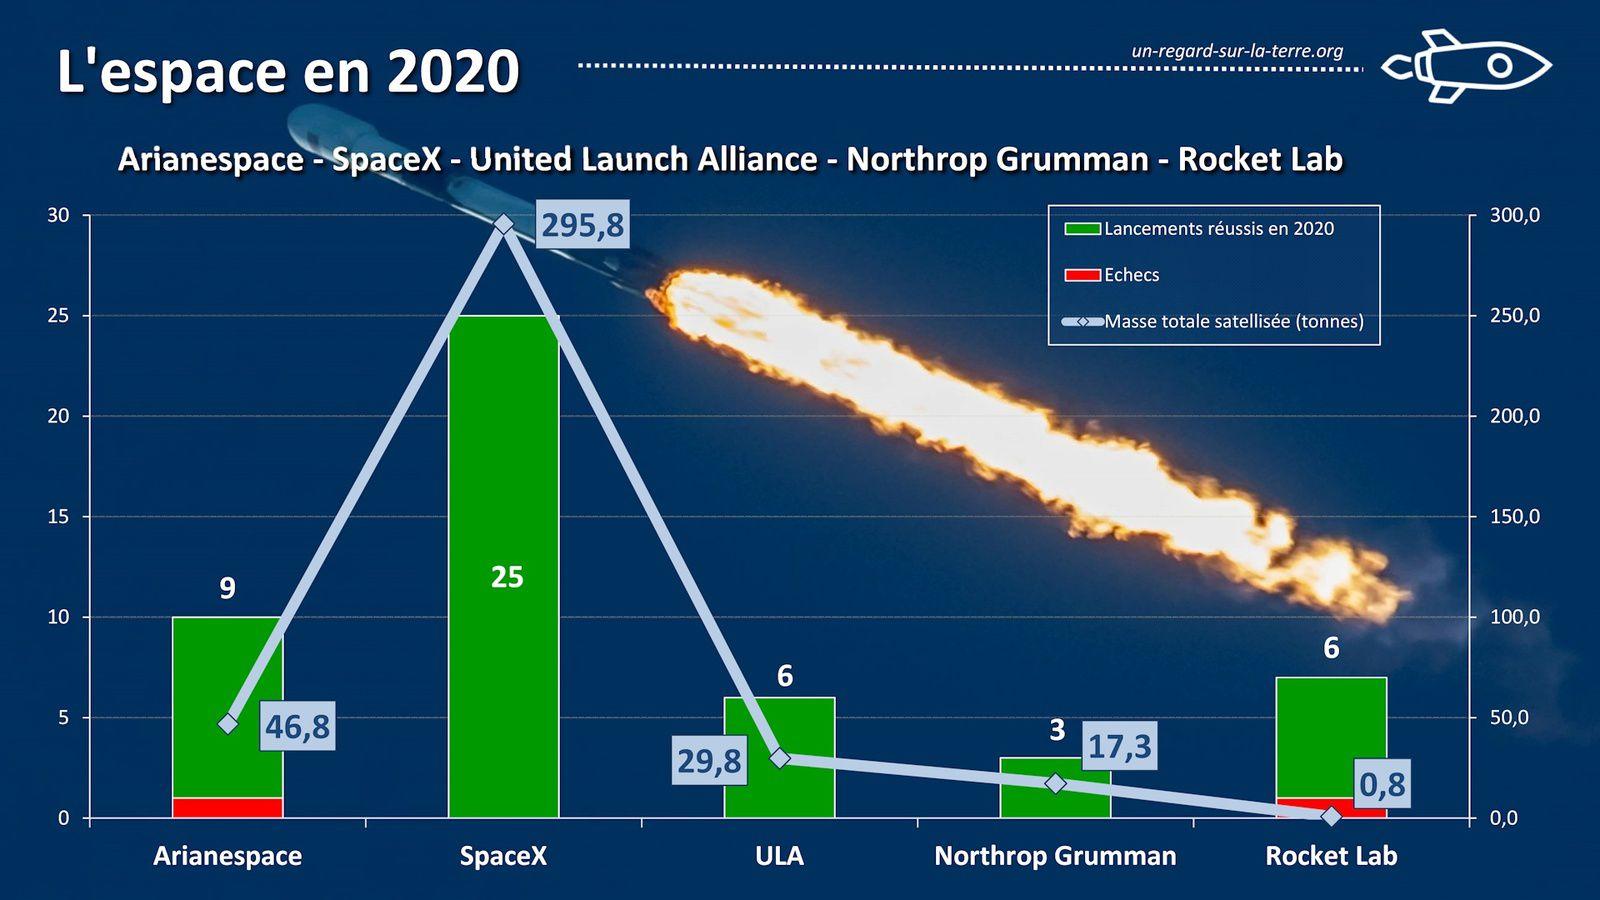 Année spatiale 2020 - Lancements orbitaux - Opérateurs de lancements - Space year in review - Arianespace - SpaceX - Rocket Lab - United Launch Alliance - Northrop Grumman